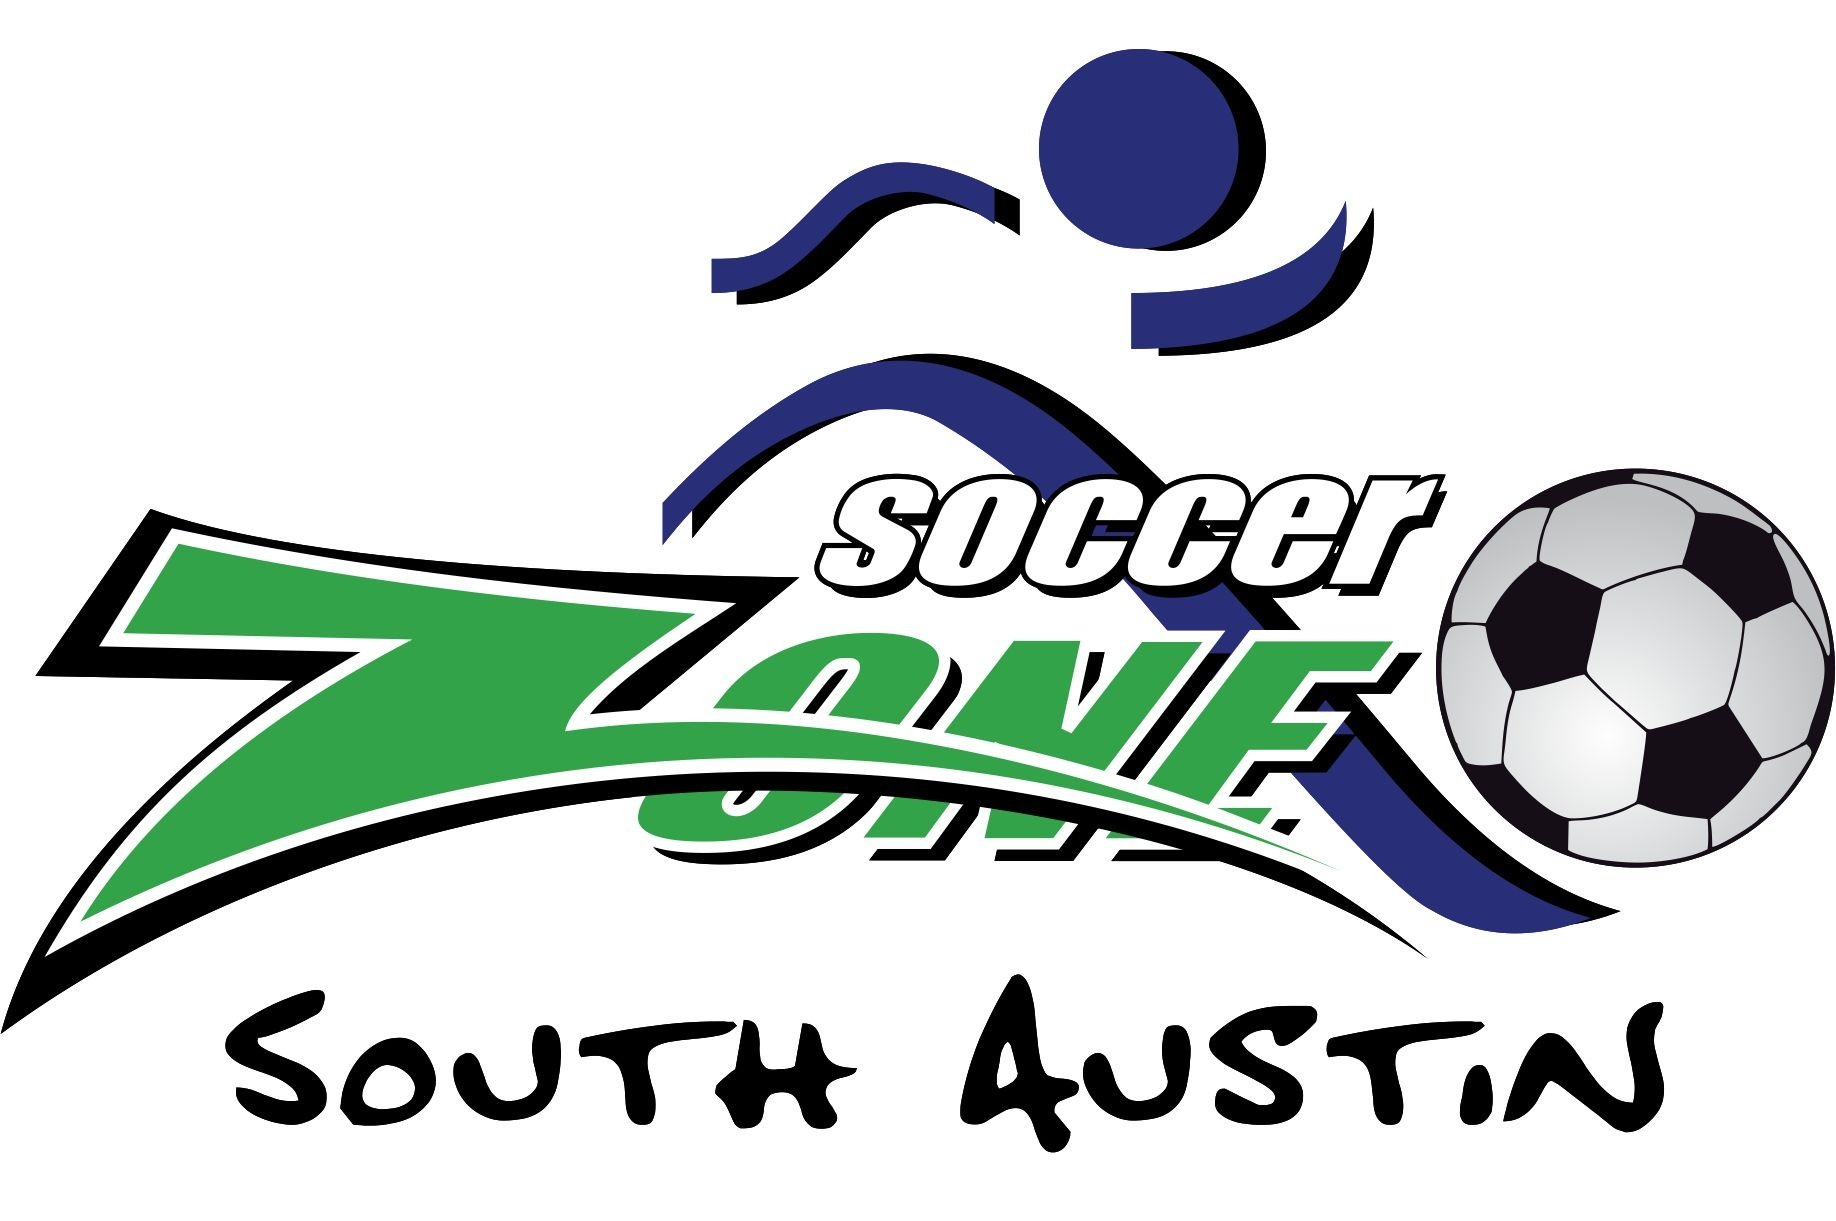 SoccerZone South Austin logo